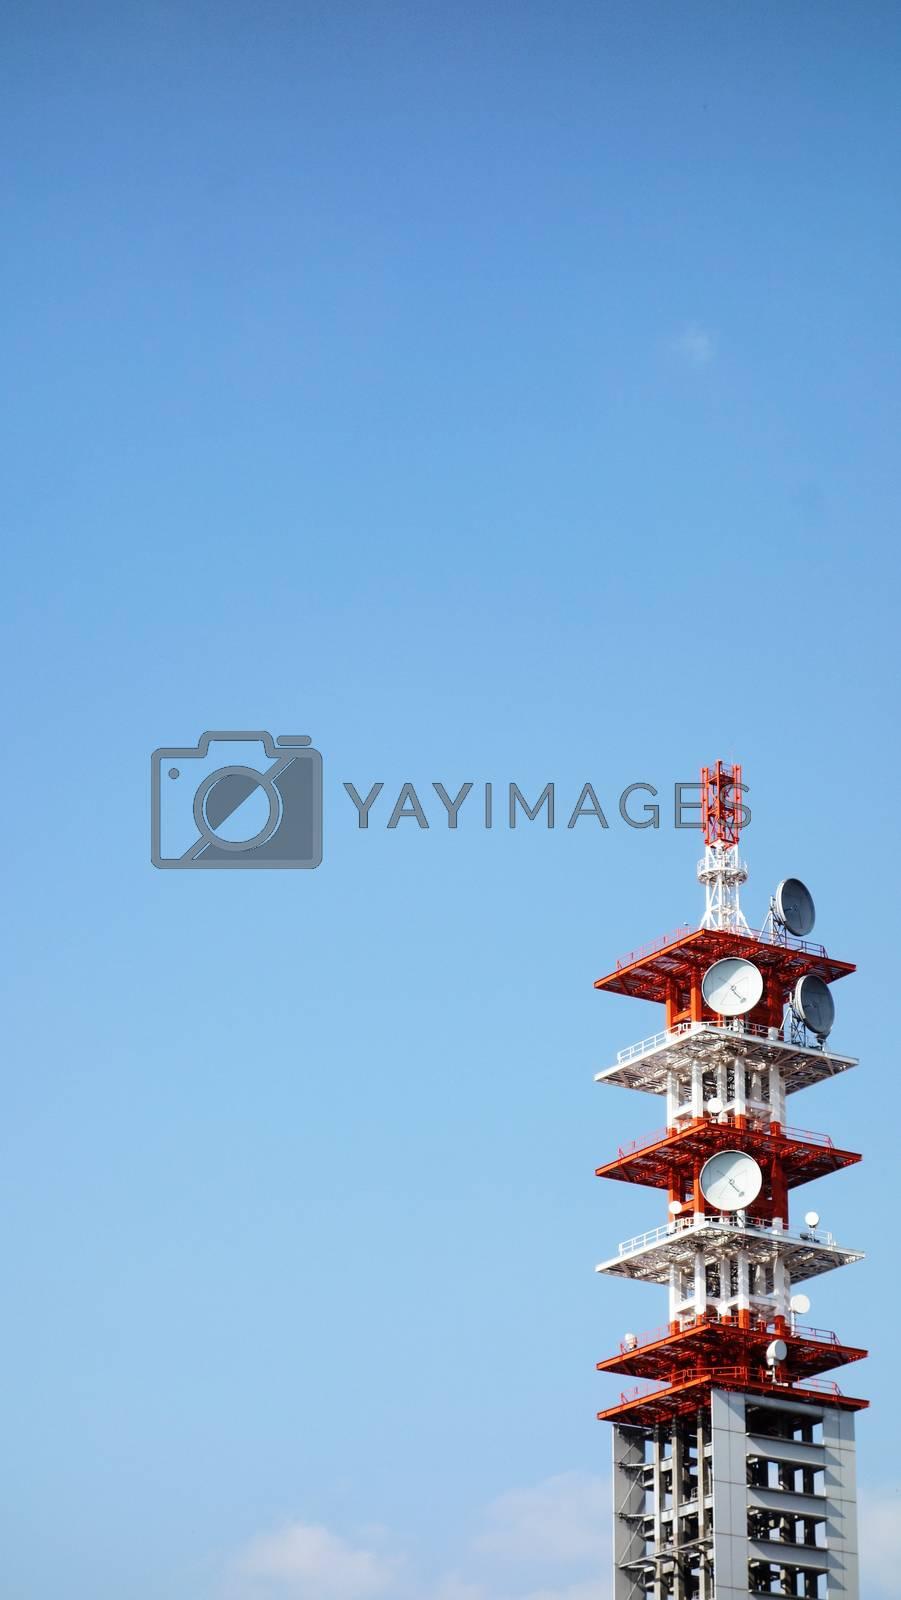 Telecommunication Antenna on Background by Kingsman911